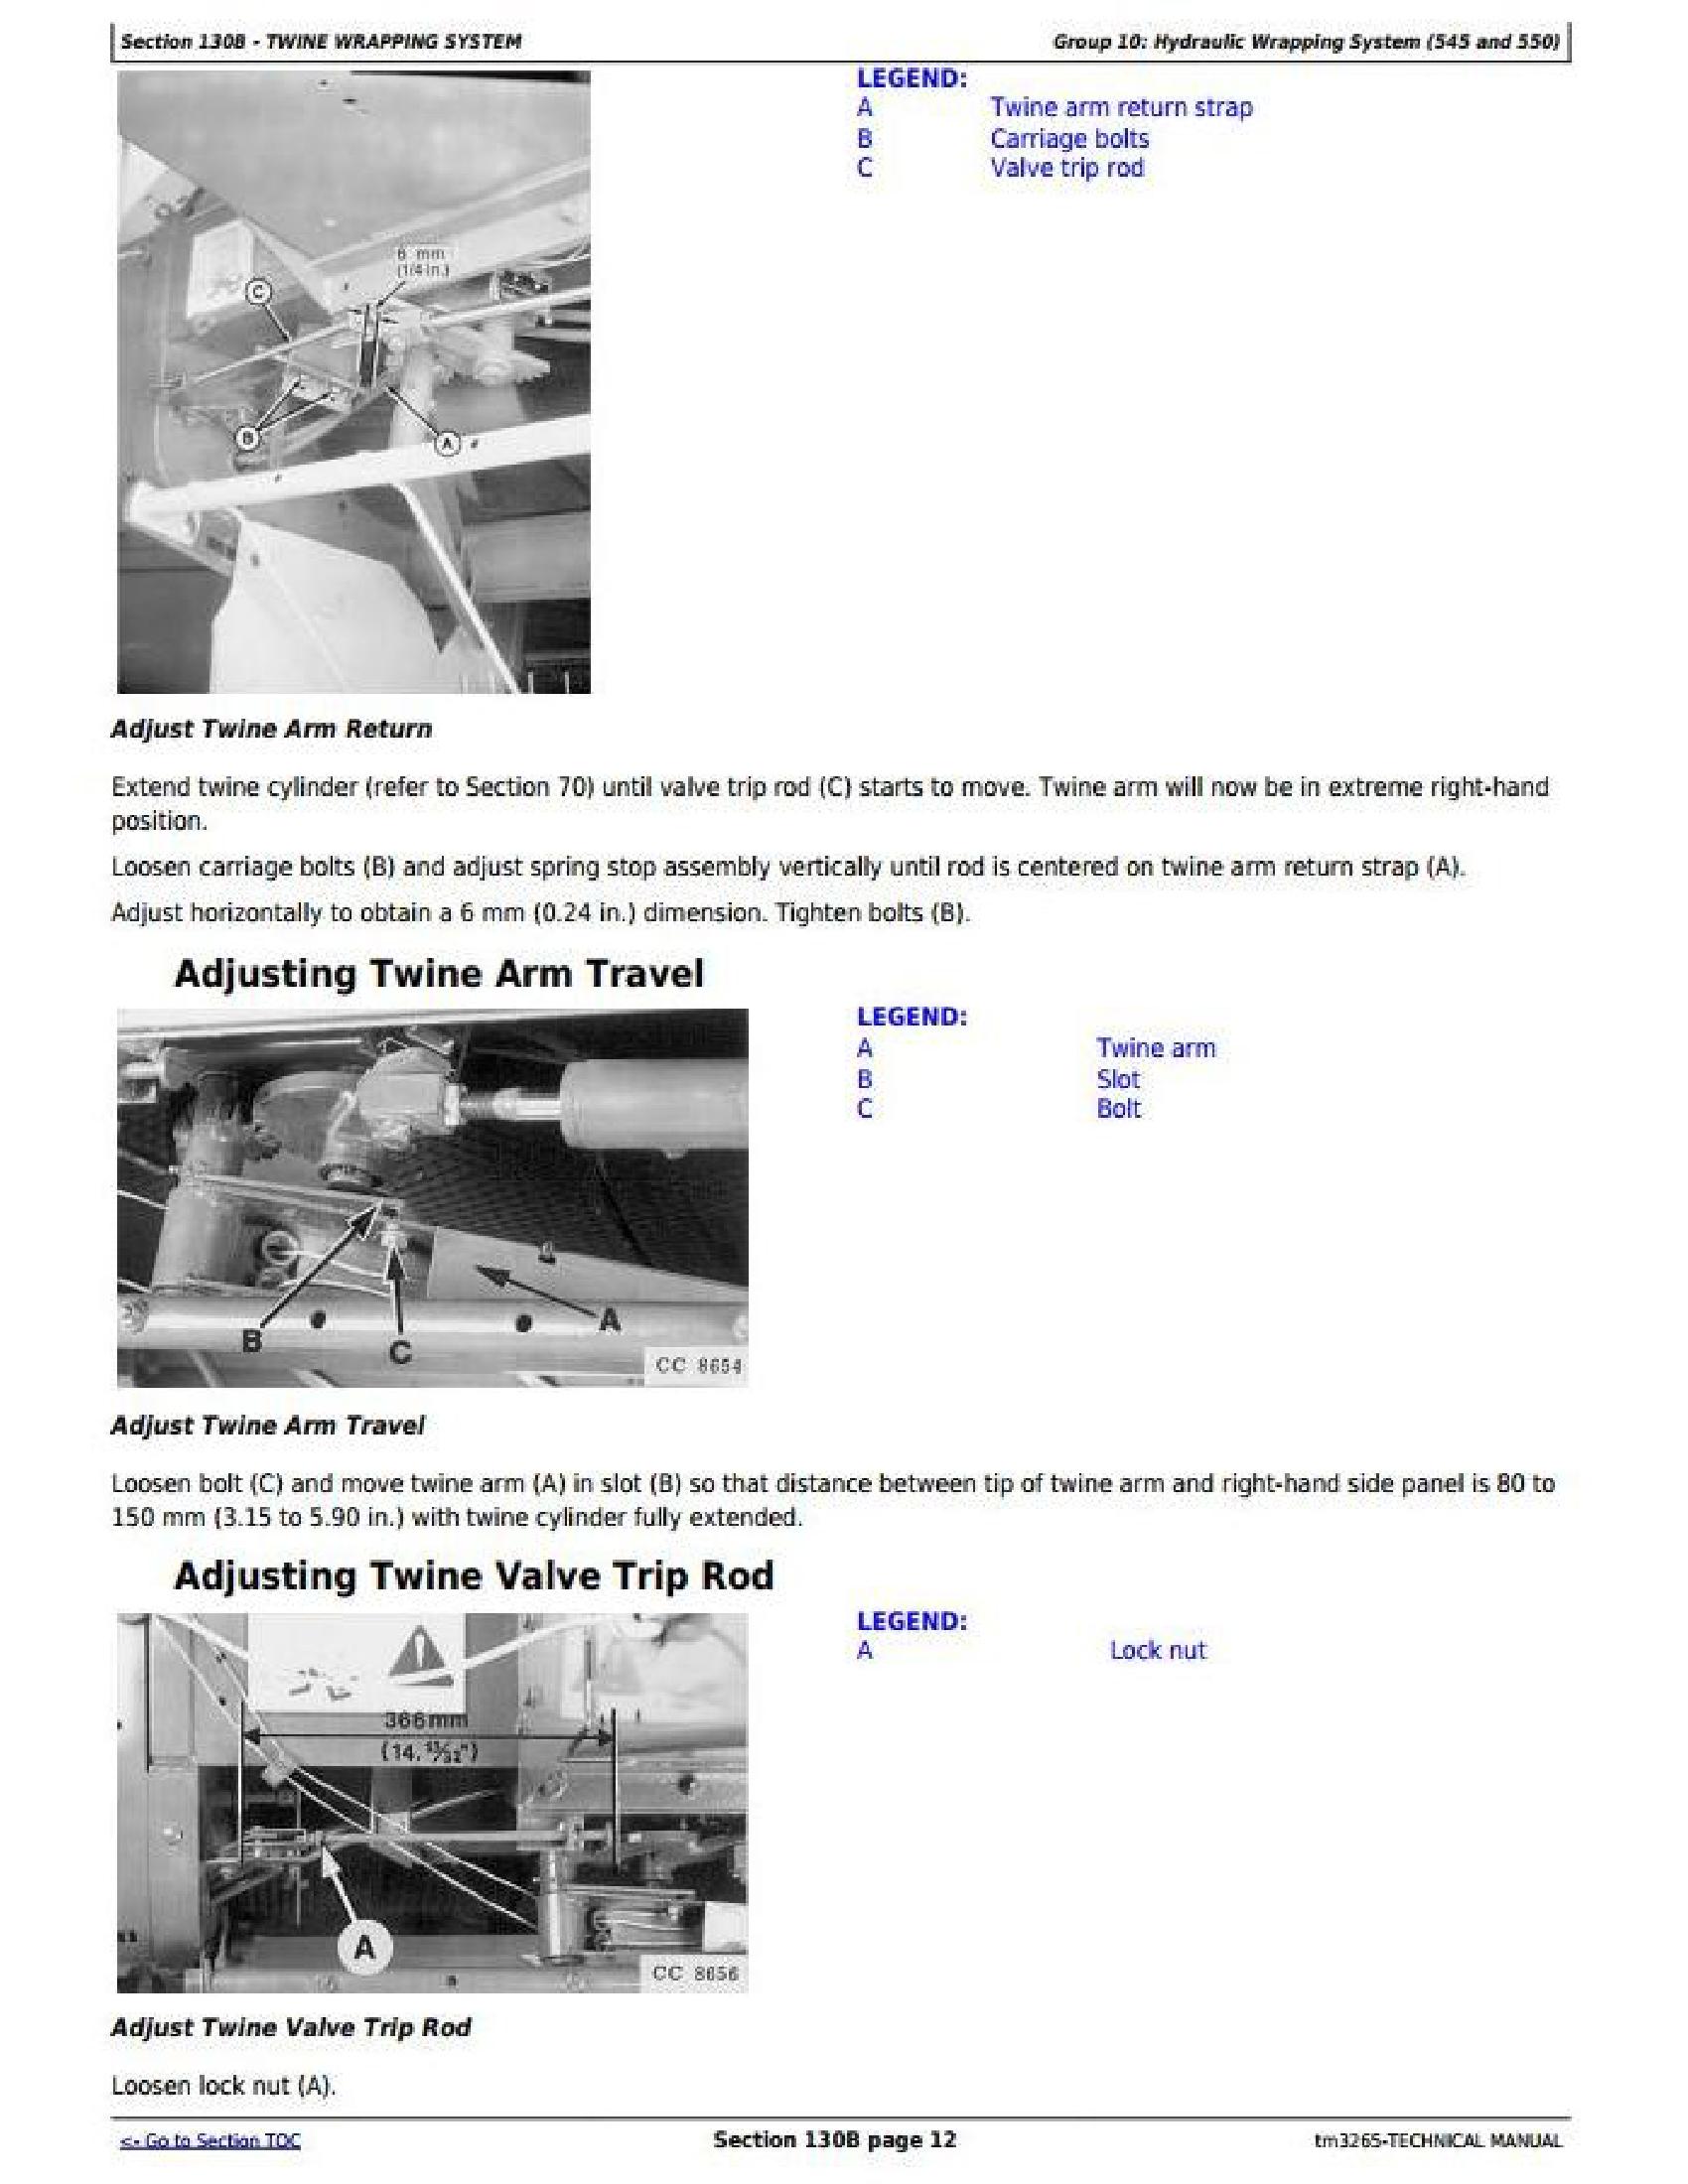 John Deere 3754D manual pdf